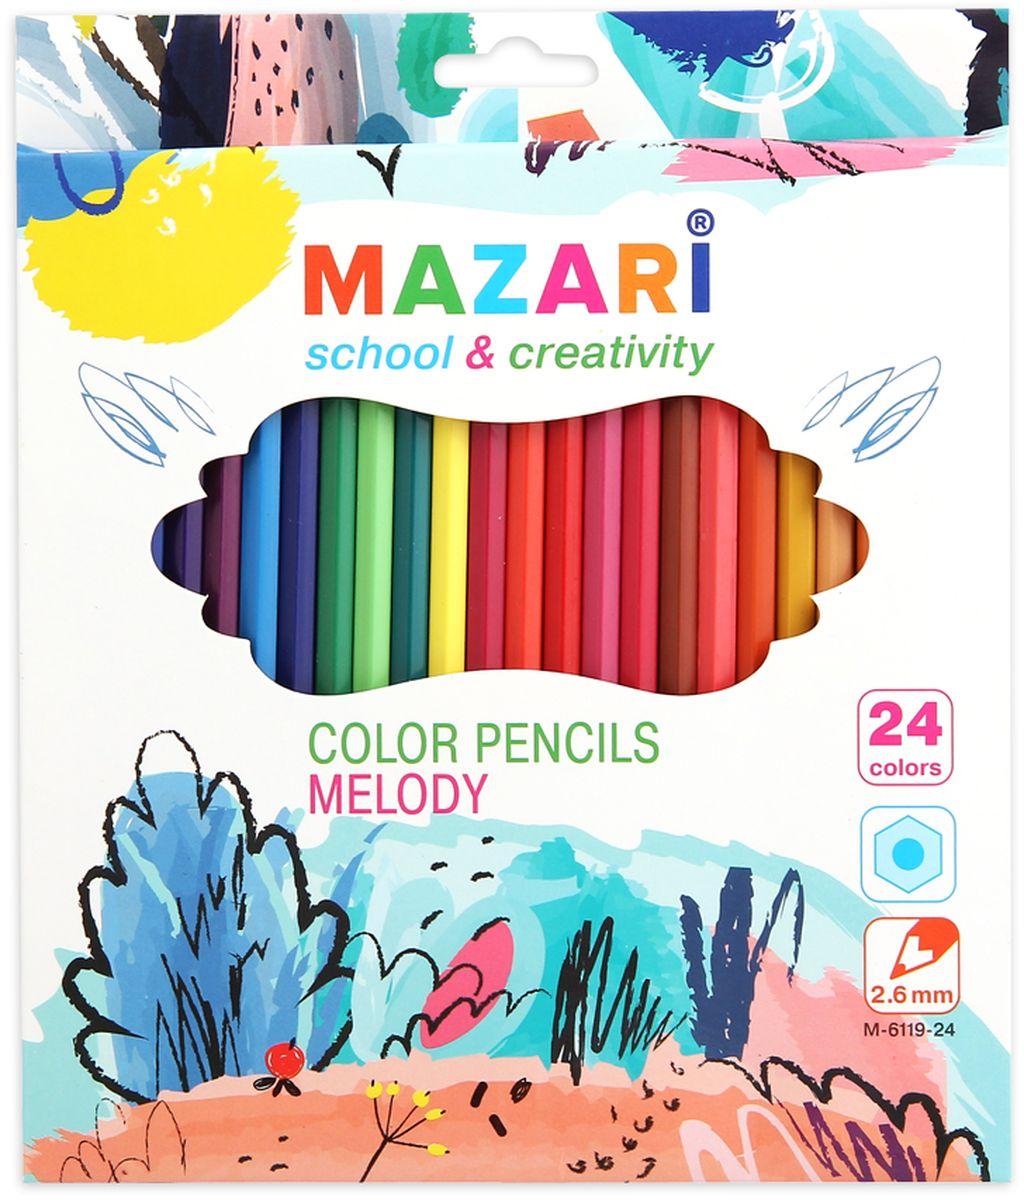 Mazari Набор цветных карандашей Melody 24 цветаМ-6119-24Карандаши цветные Mazari Melody предназначены для письма, рисования и черчения. Карандаши имеют шестигранную форму, диаметр грифеля - 2,6 мм. В наборе 24 карандаша ярких цветов.